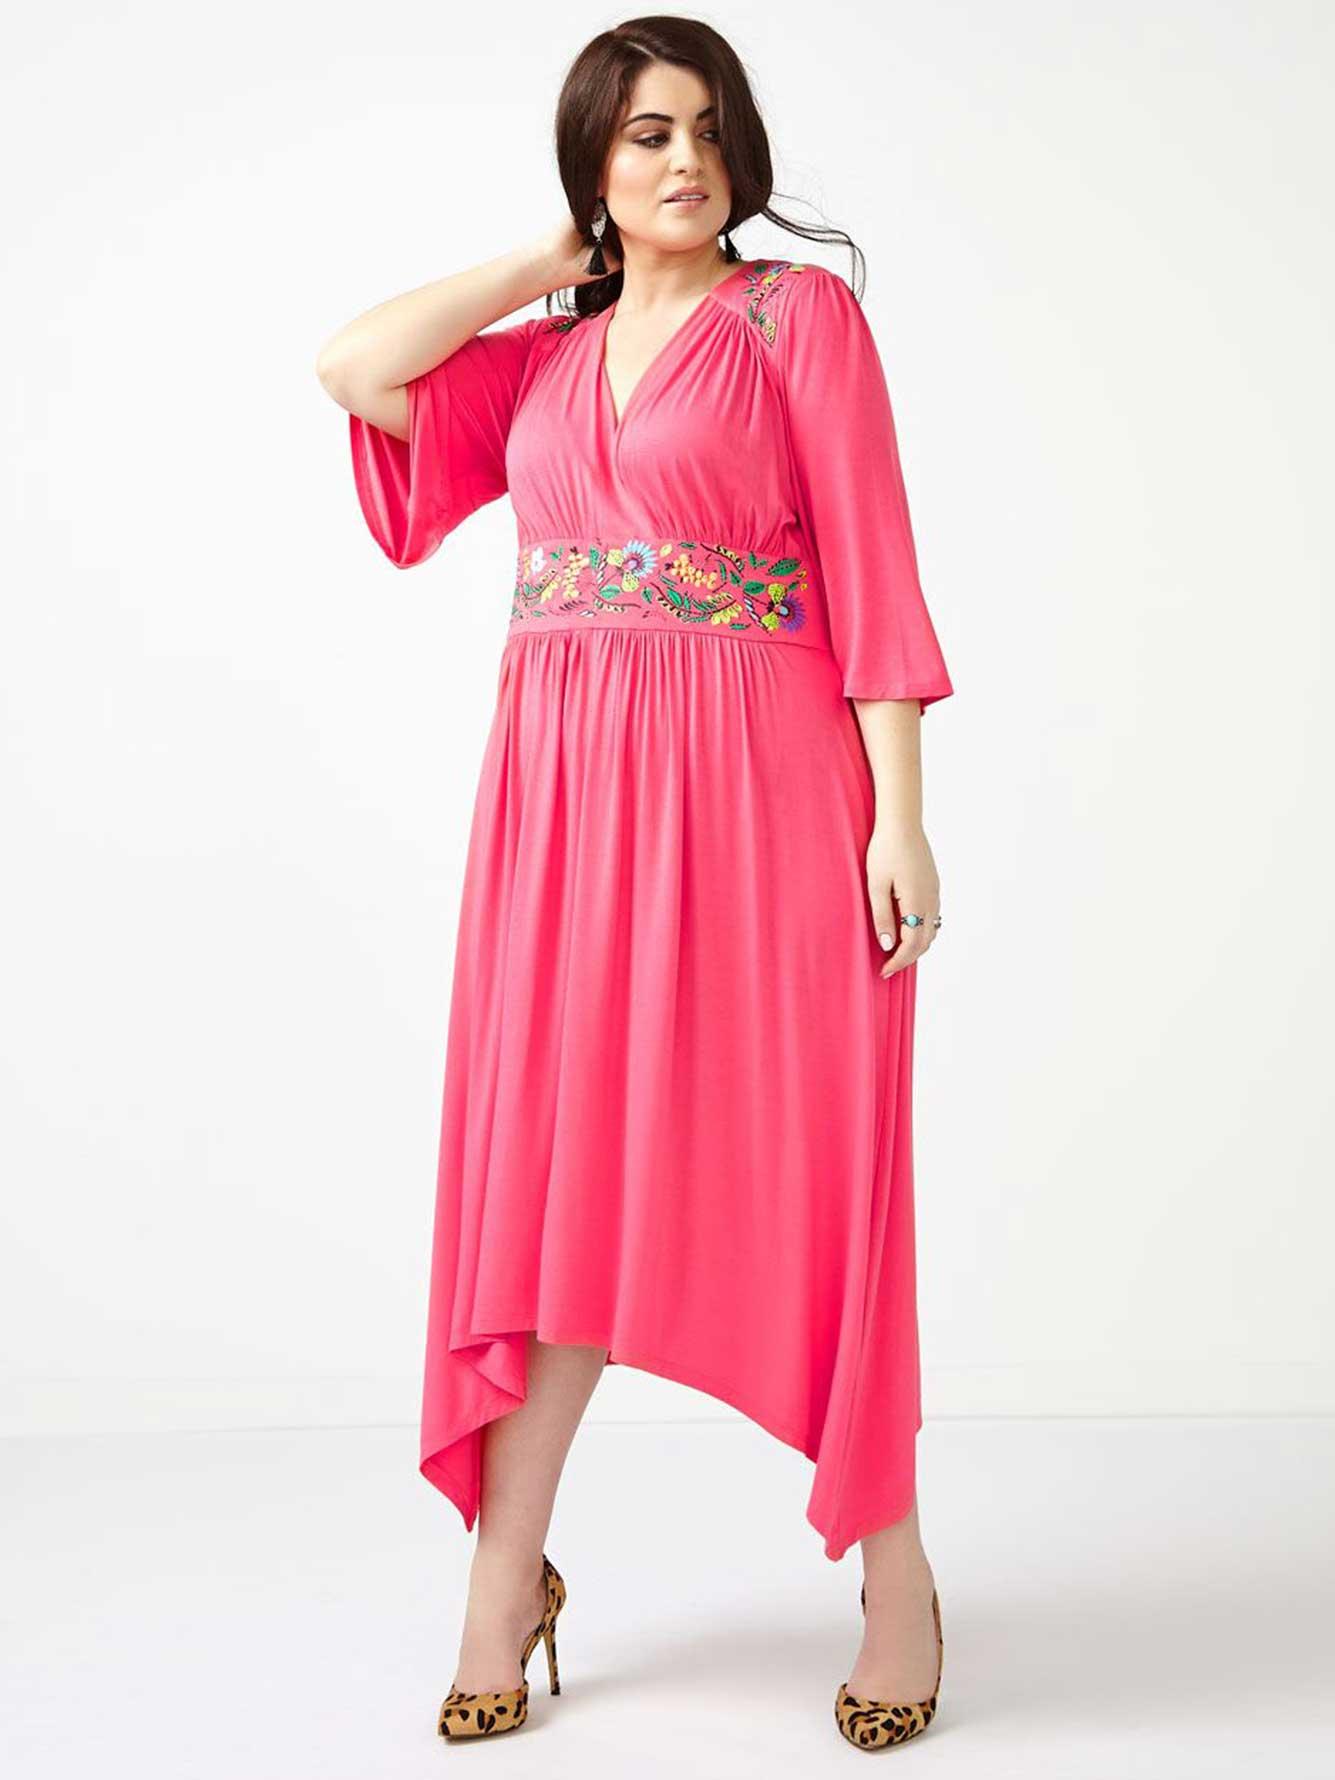 0fec99ae307 MELISSA McCARTHY 3 4 Sleeve Maxi Dress